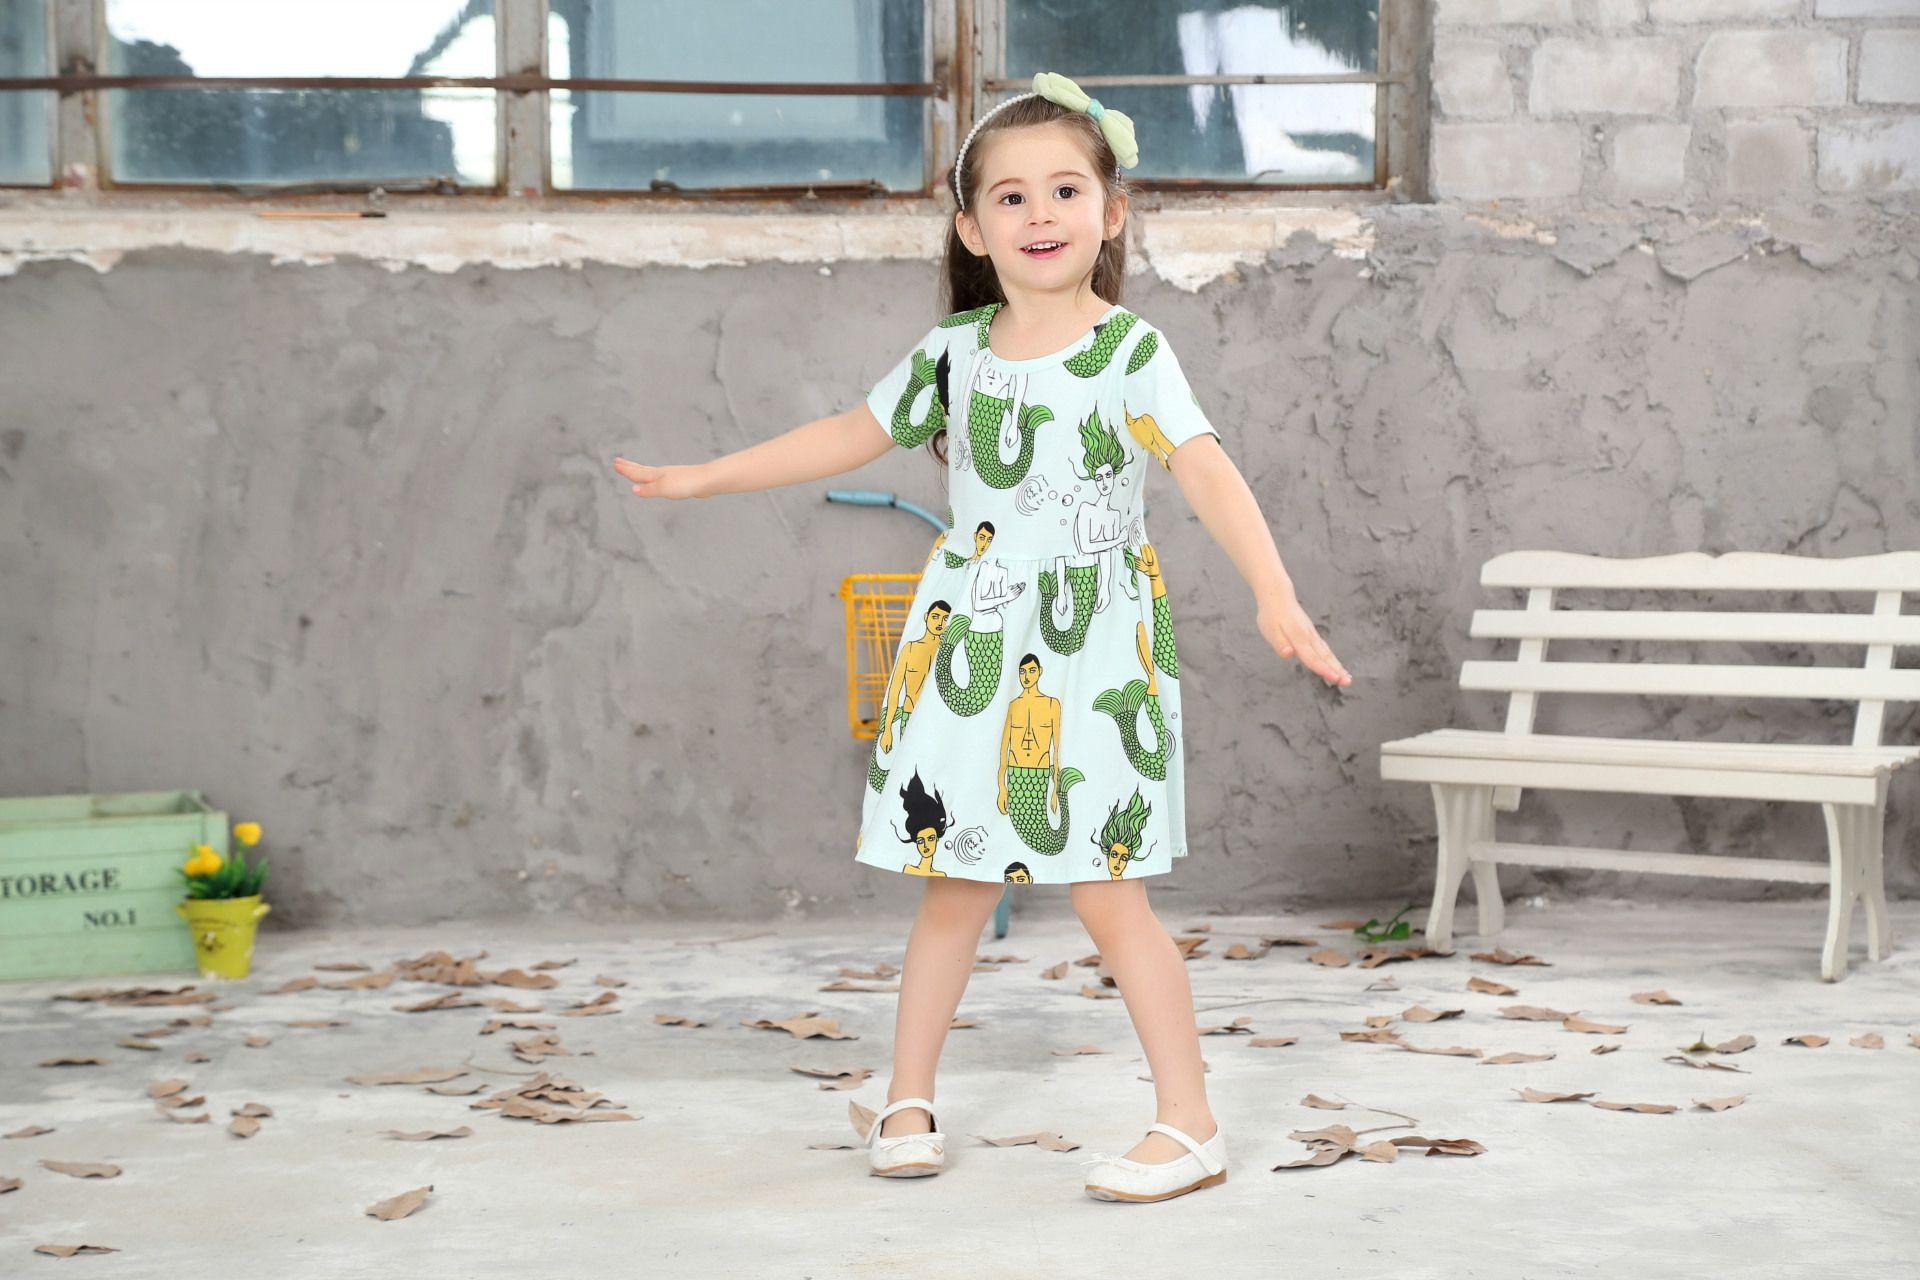 New Girls Princess Cartoon Mermaids Dress Baby Short Sleeve Cotton Round Neck Dresses For 1-9T Children Kids Shirt Pleated Dress Wholesale